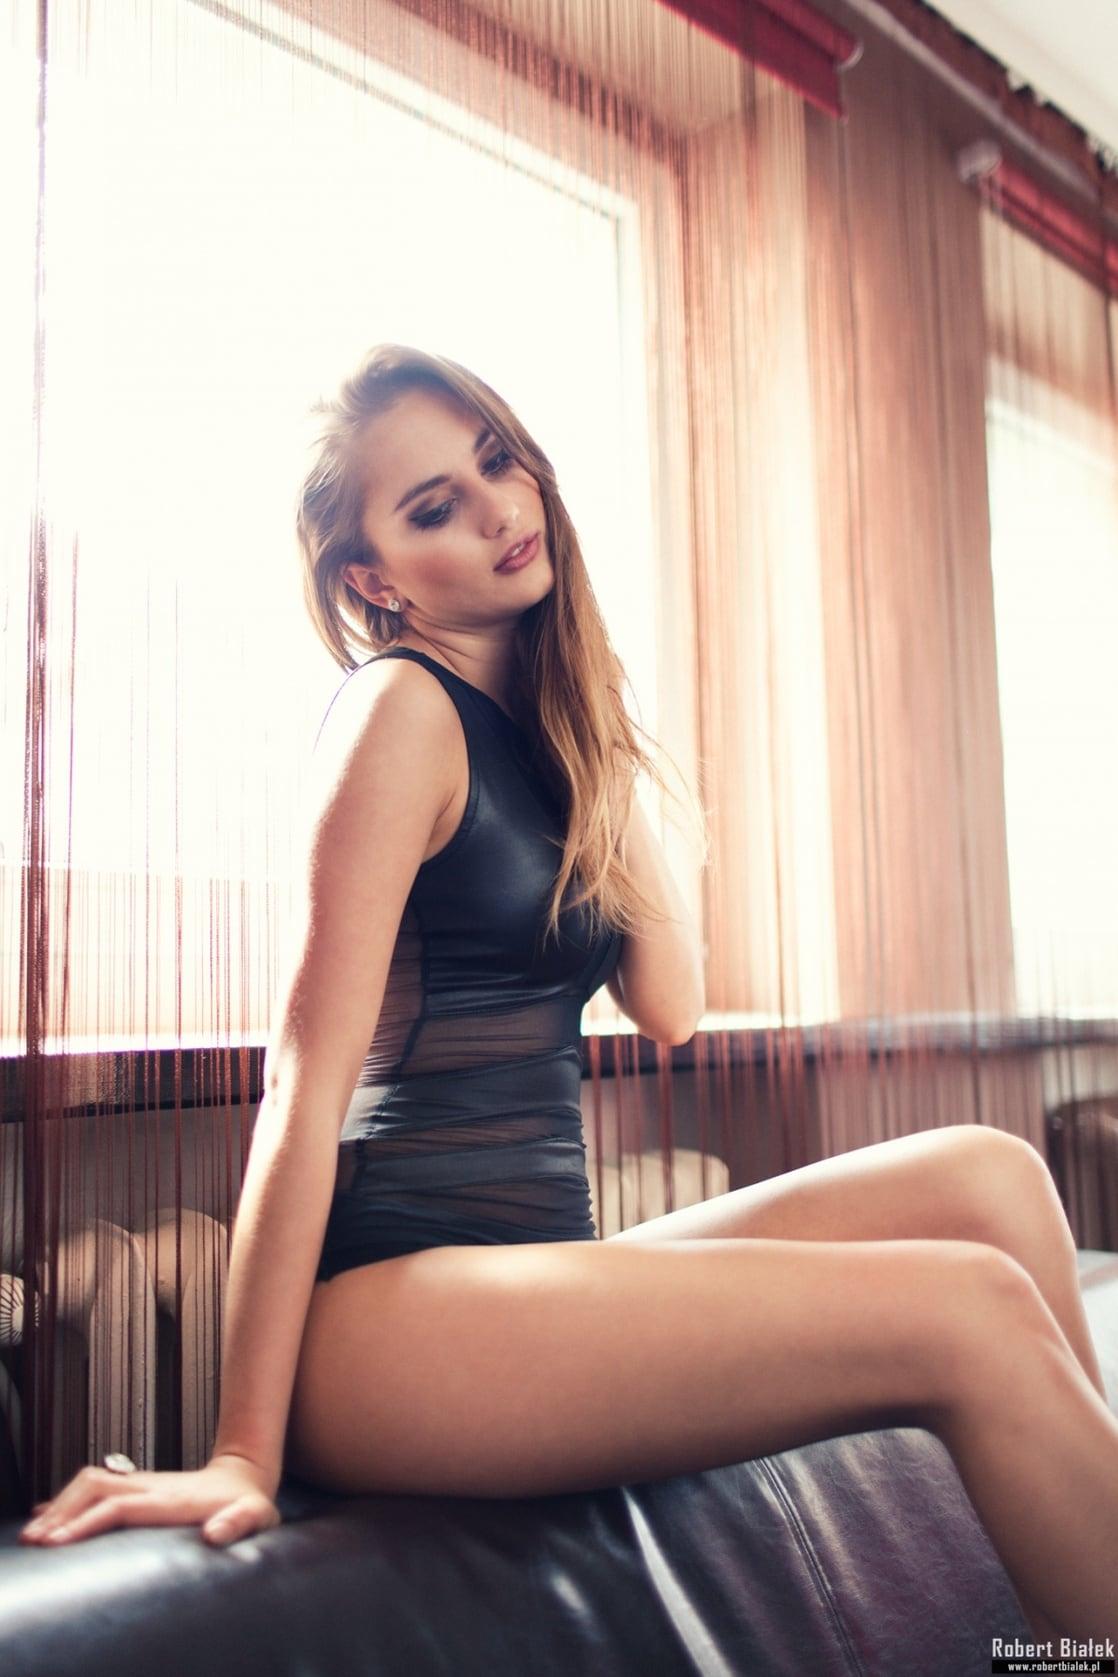 ICloud Paulina Mikolajczak nude (89 photo), Pussy, Cleavage, Boobs, butt 2019